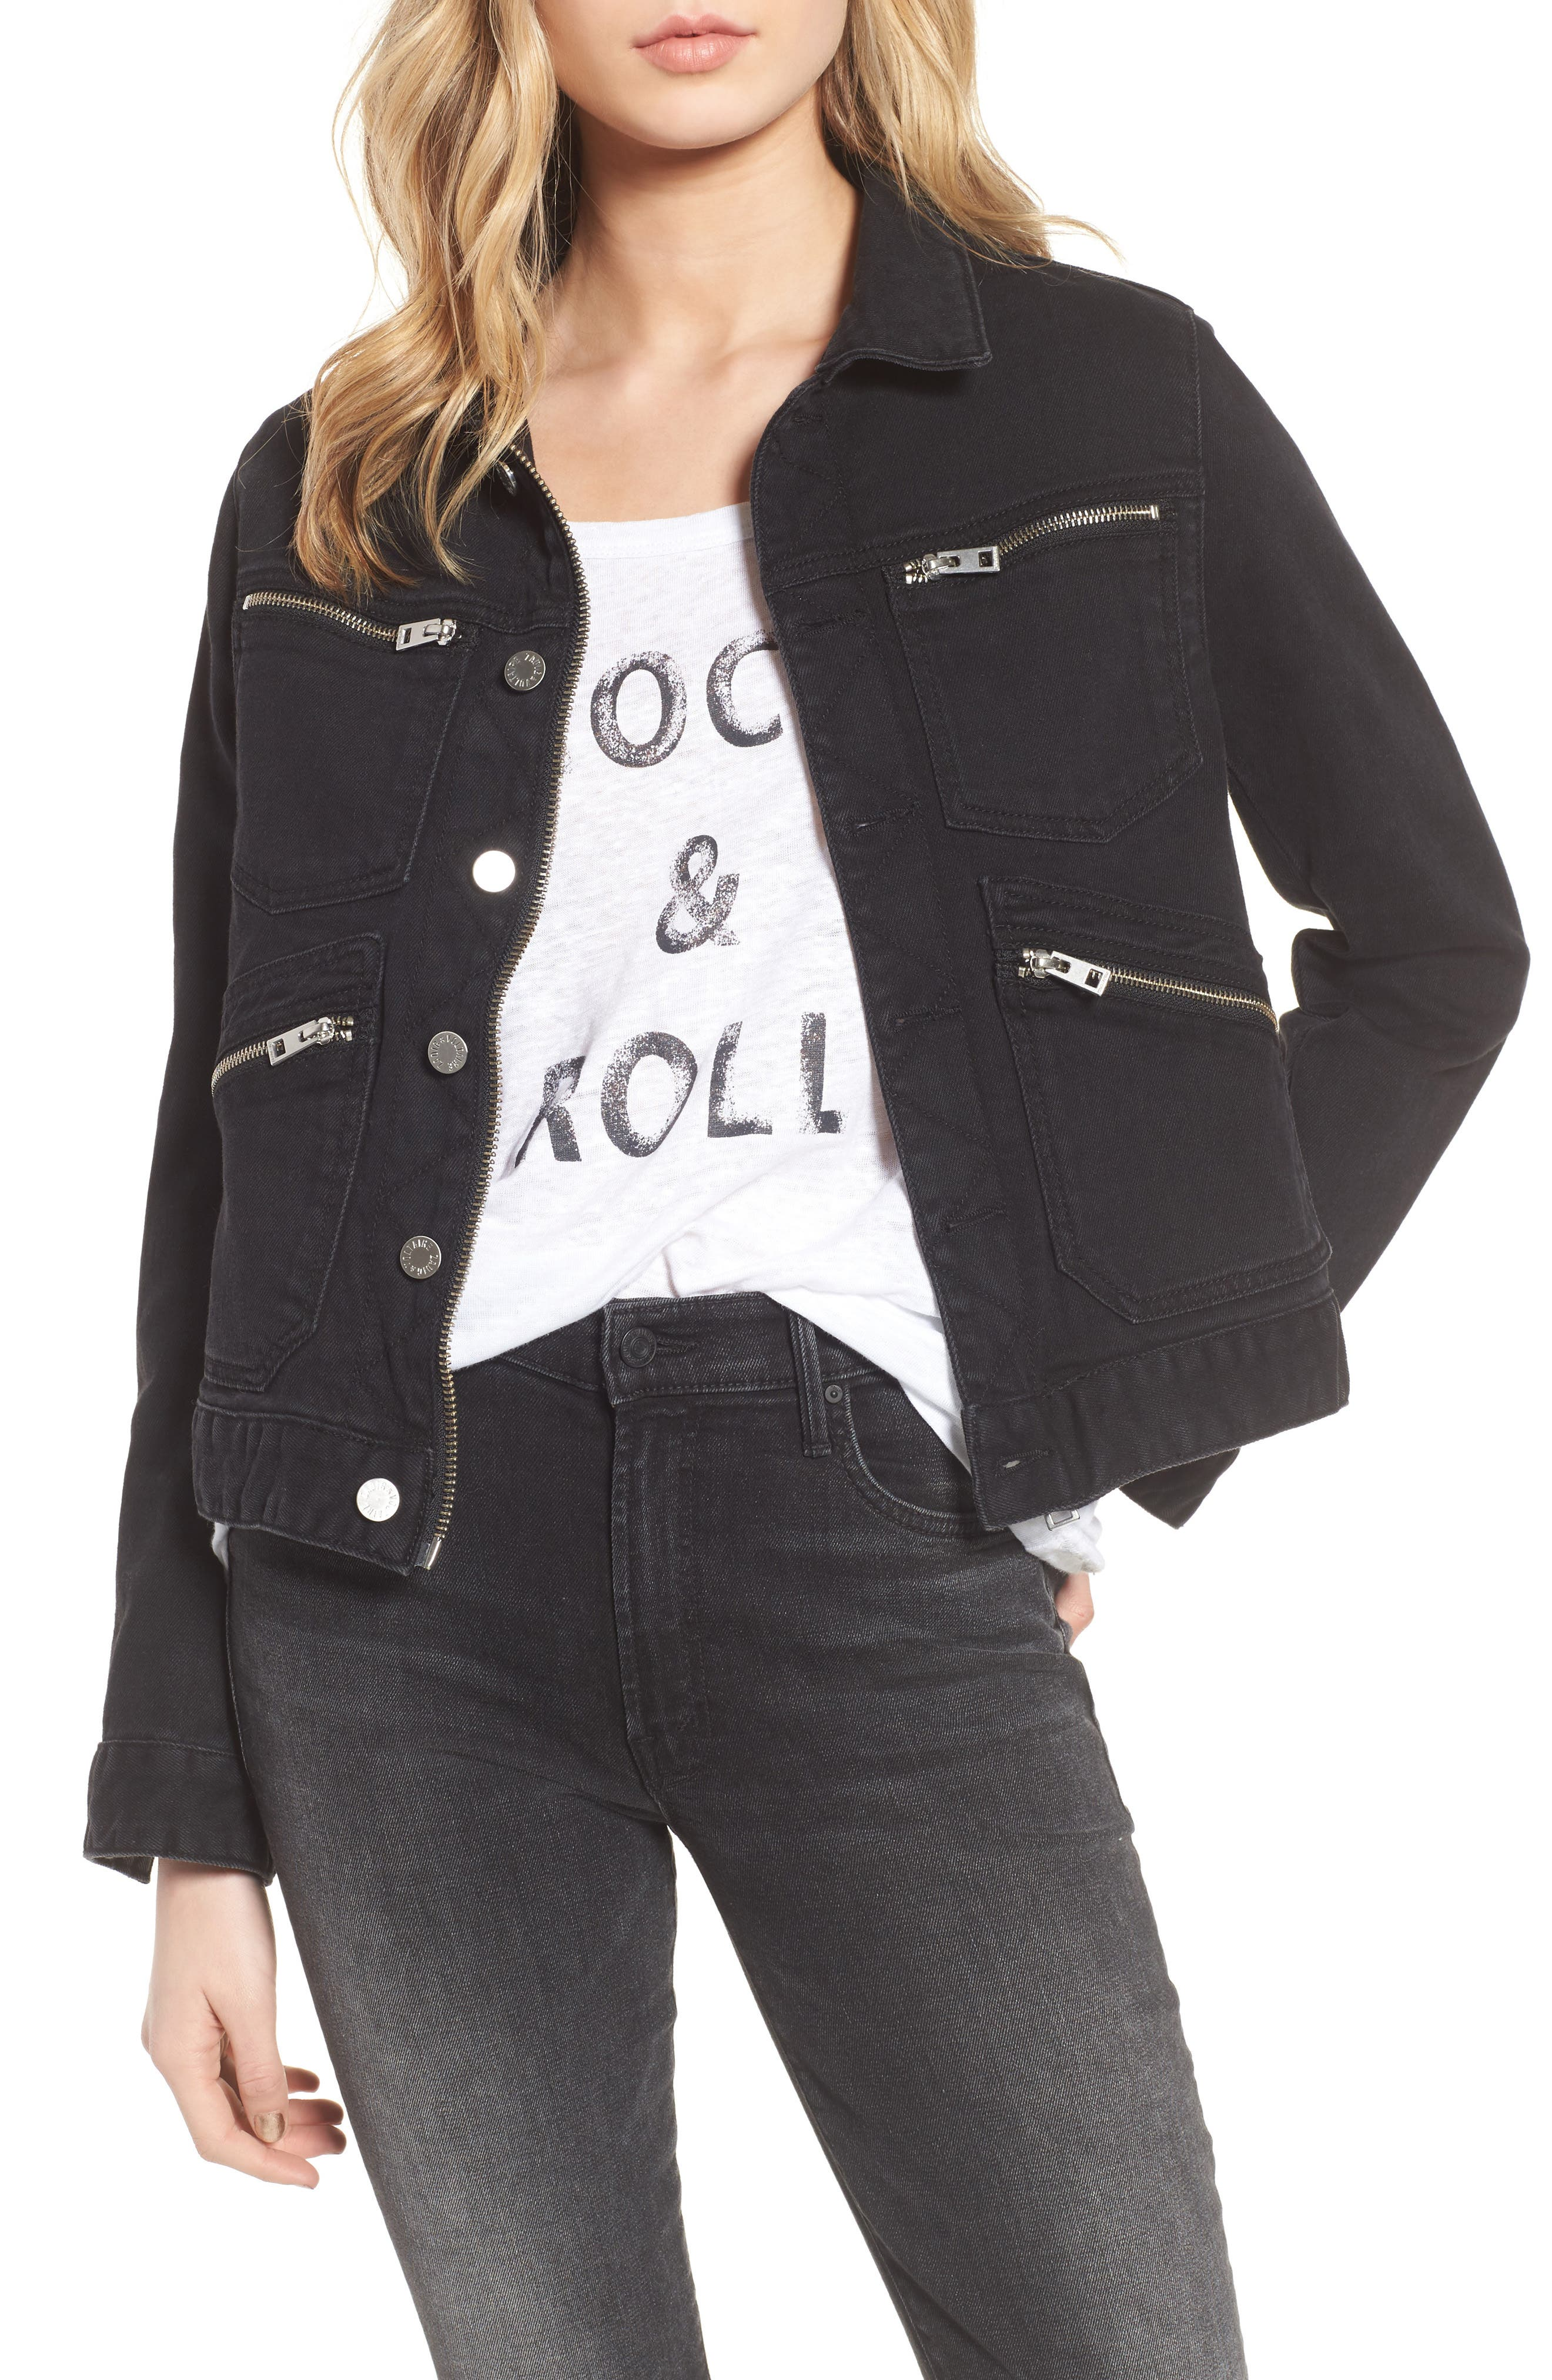 Kioko Cat Jacket,                         Main,                         color,